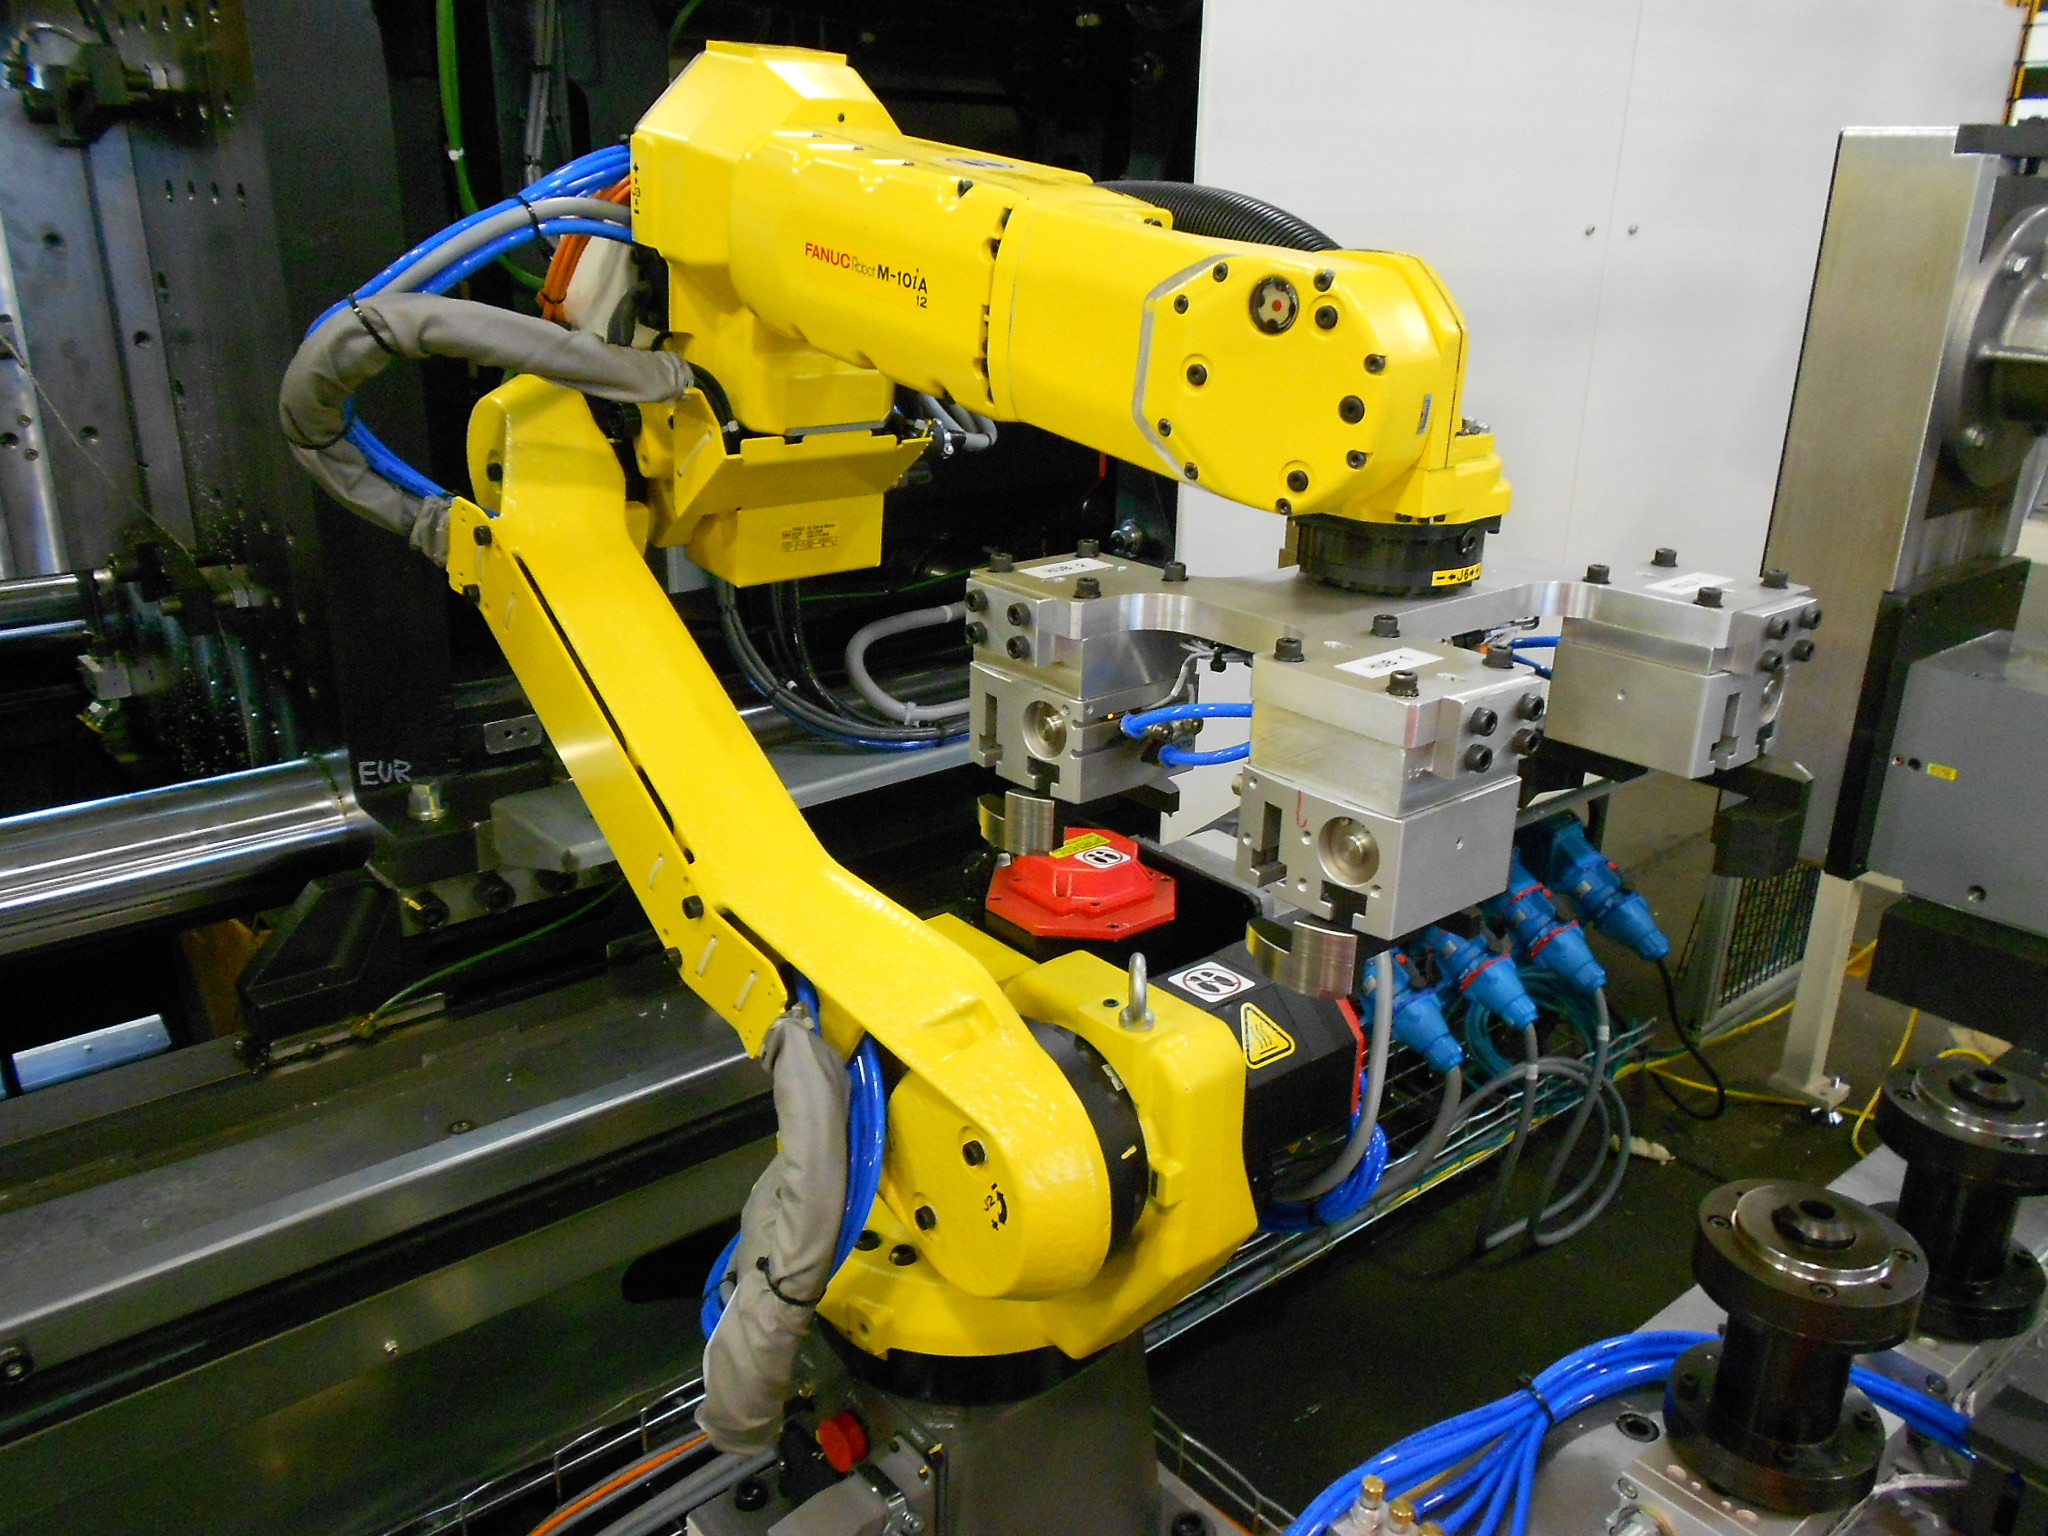 Robot - Mold Cell Integration